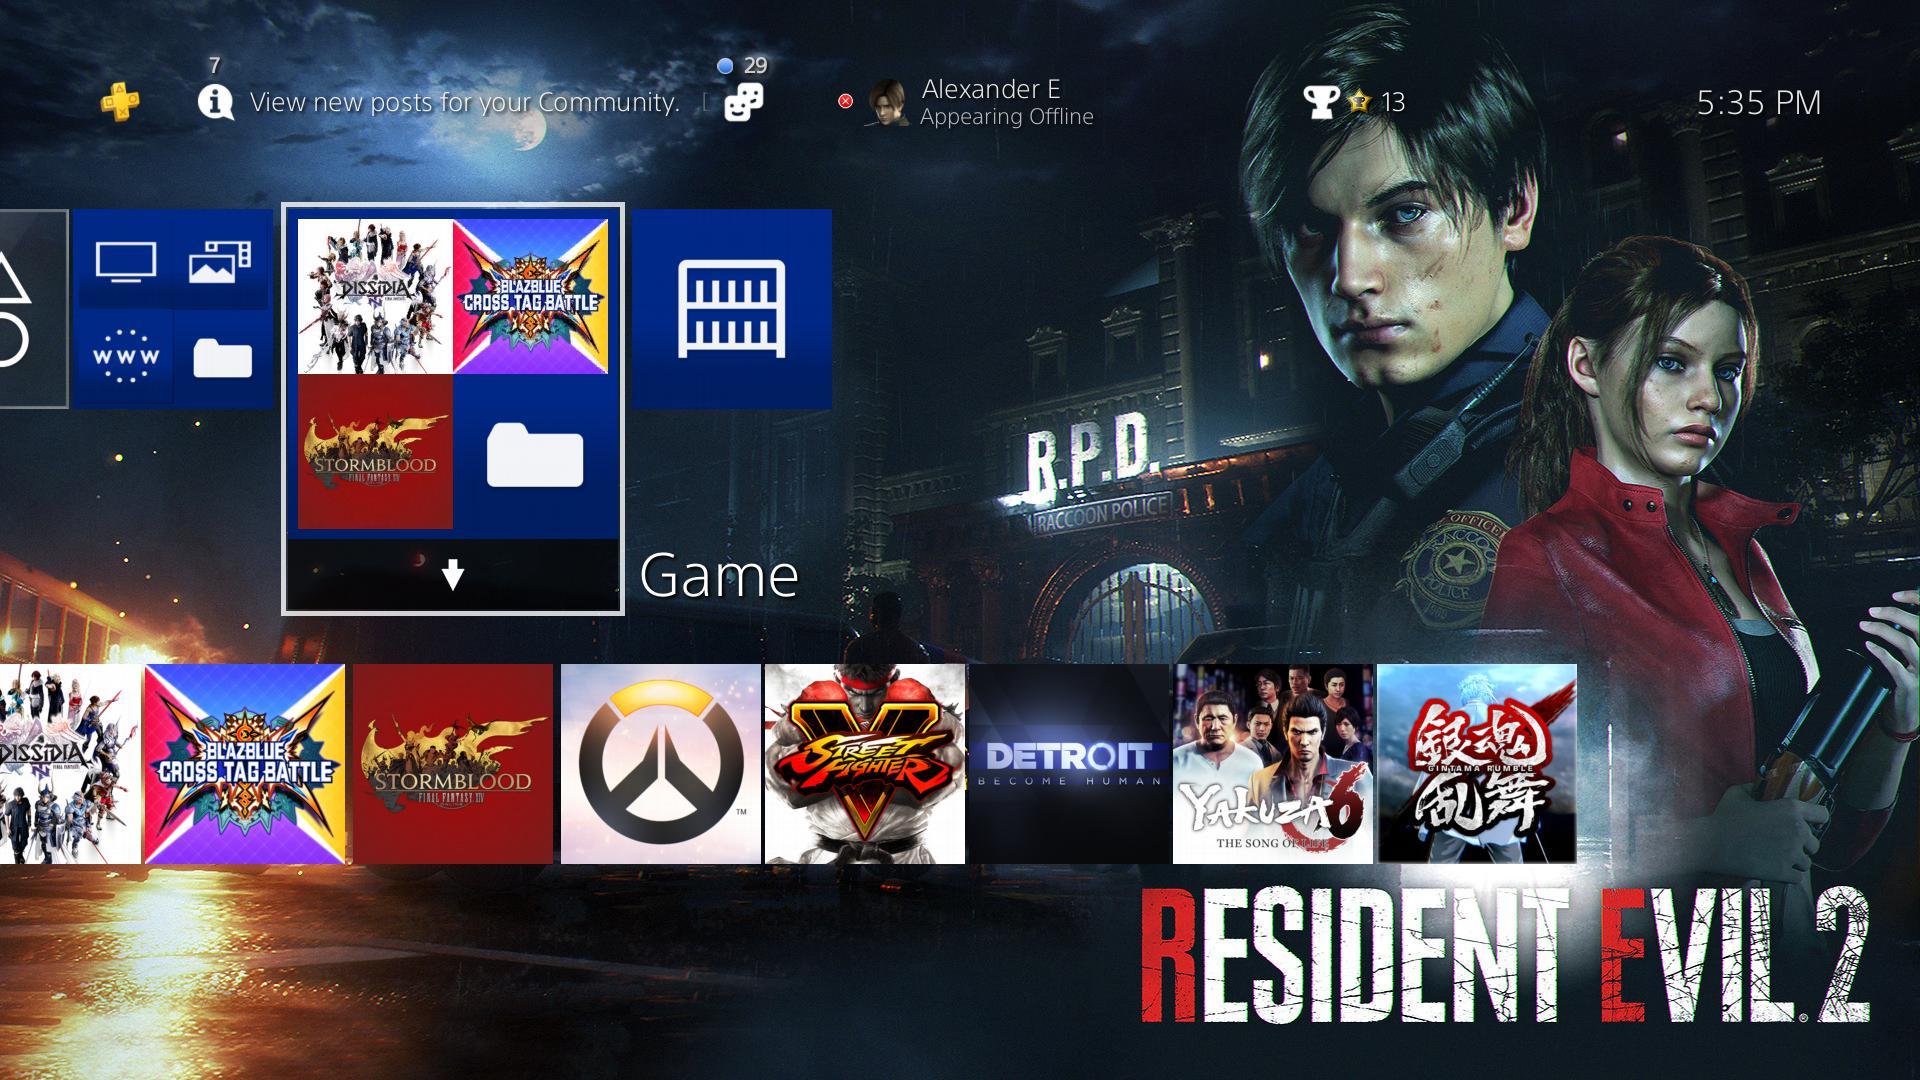 Resident Evil Logo K Hd Games K Wallpapers Images